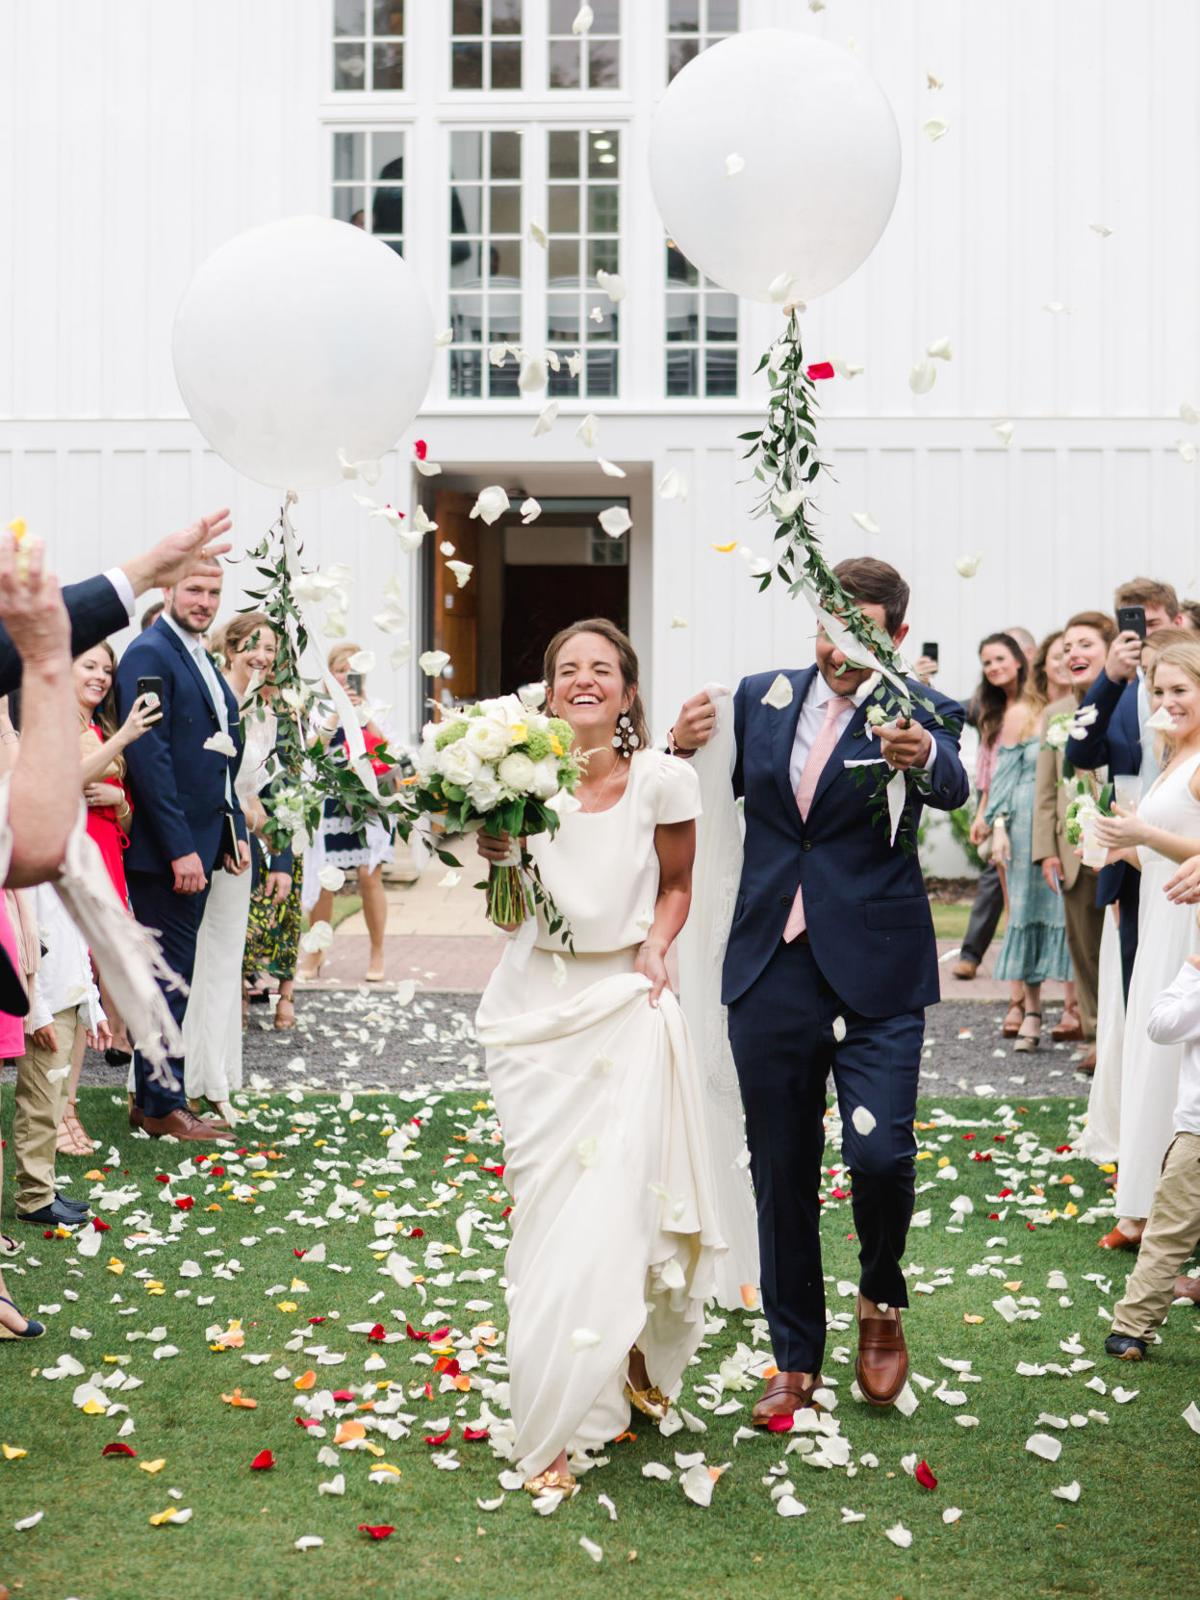 Mary Elizabeth Adams and Scott Grant exchange vows in Seaside - 2